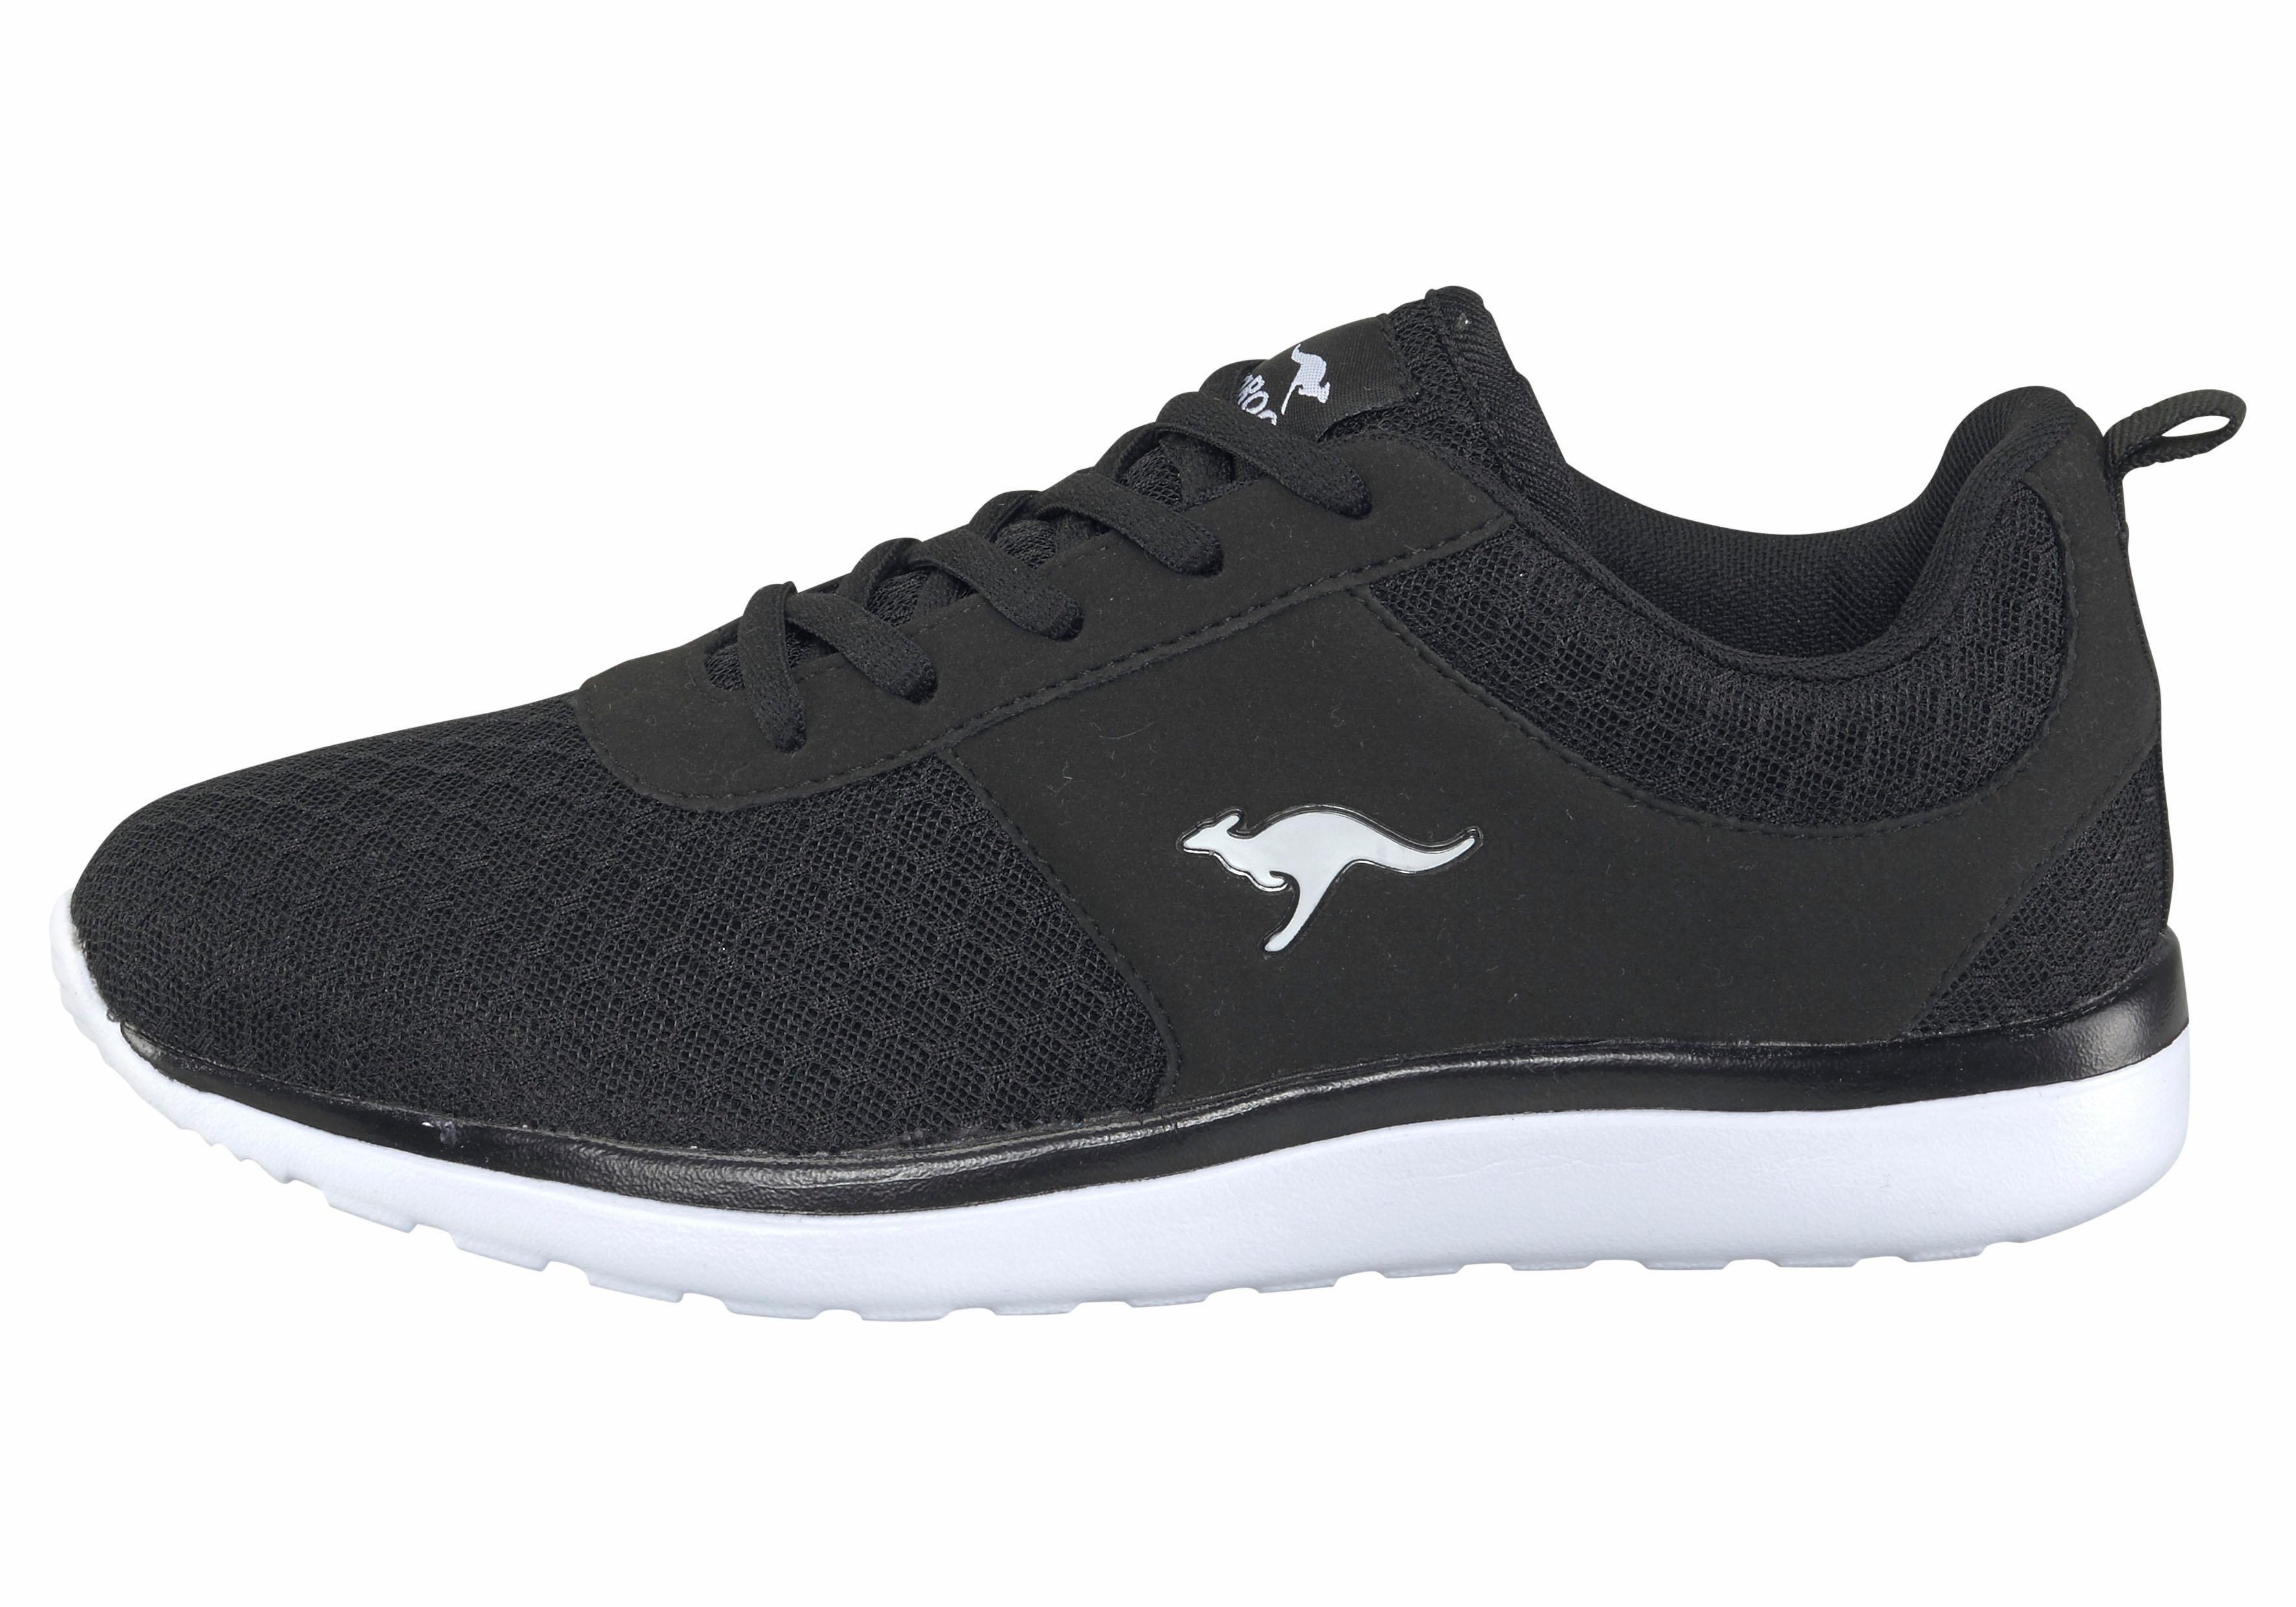 Kangaroos Sneakersbumpy Bestellen Sneakersbumpy Online Online Bestellen Sneakersbumpy Bestellen Kangaroos Online Kangaroos Rj4AL53